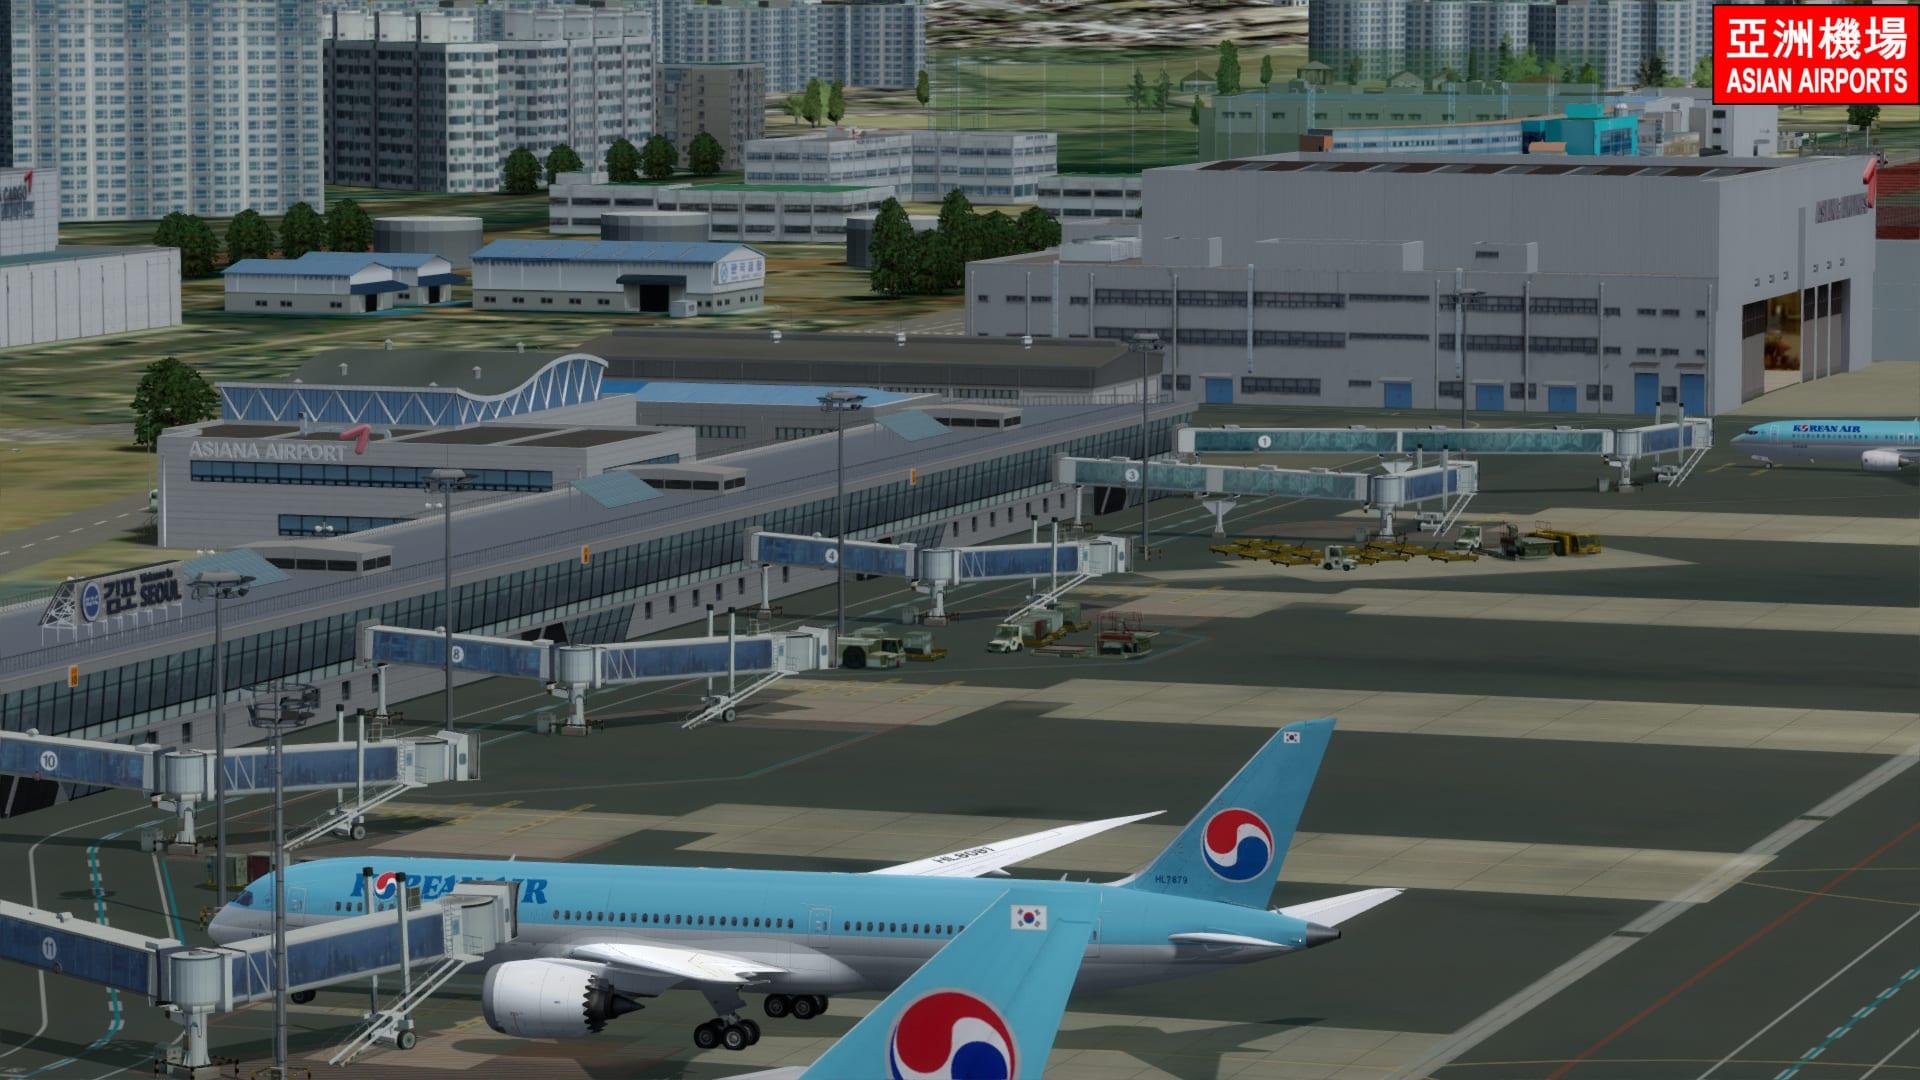 Asian Airport – Seoul Gimpo RKSS P3D5